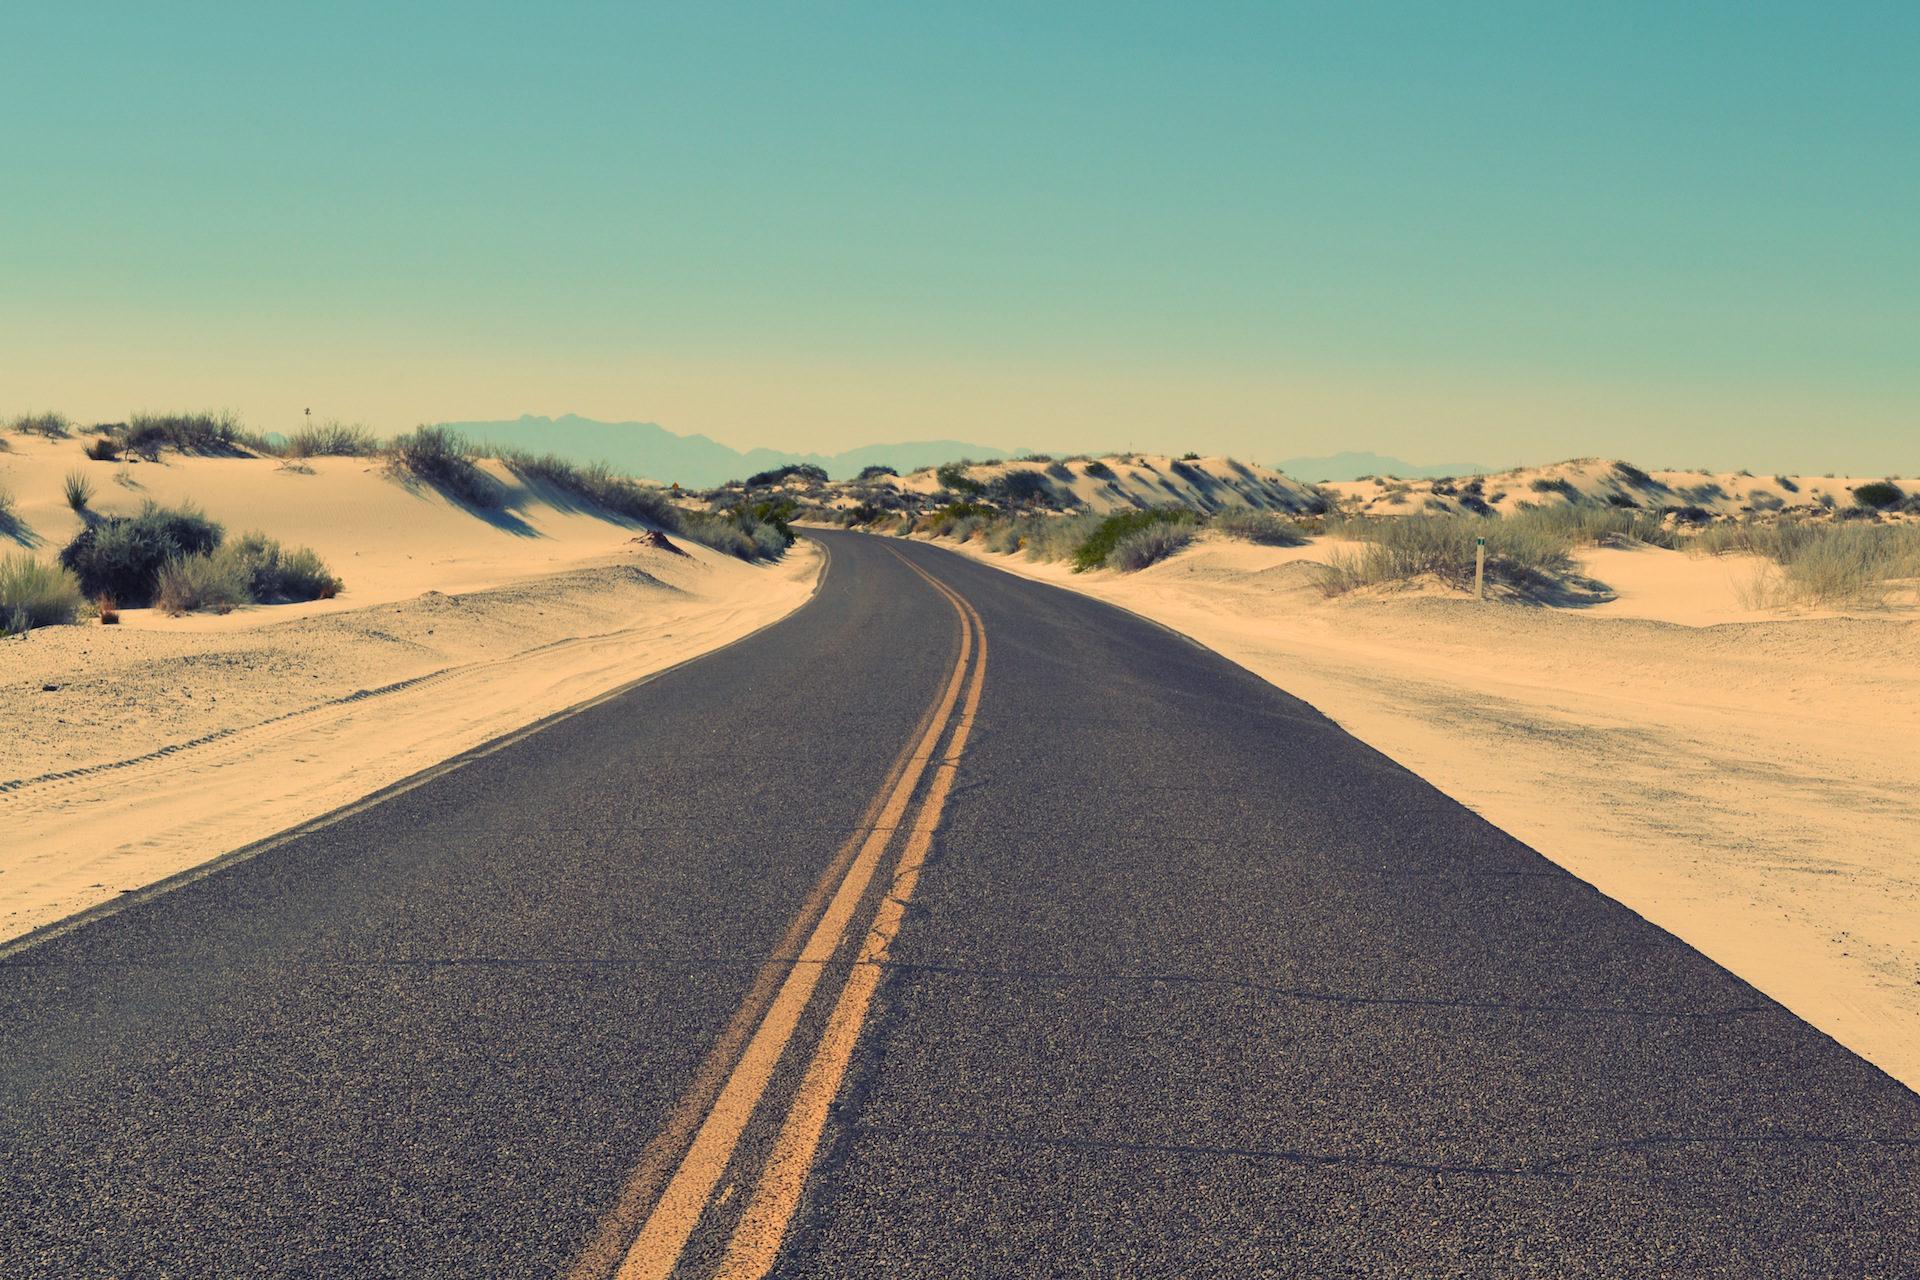 carretera, asfalto, desierto, arena, perdido - Fondos de Pantalla HD - professor-falken.com